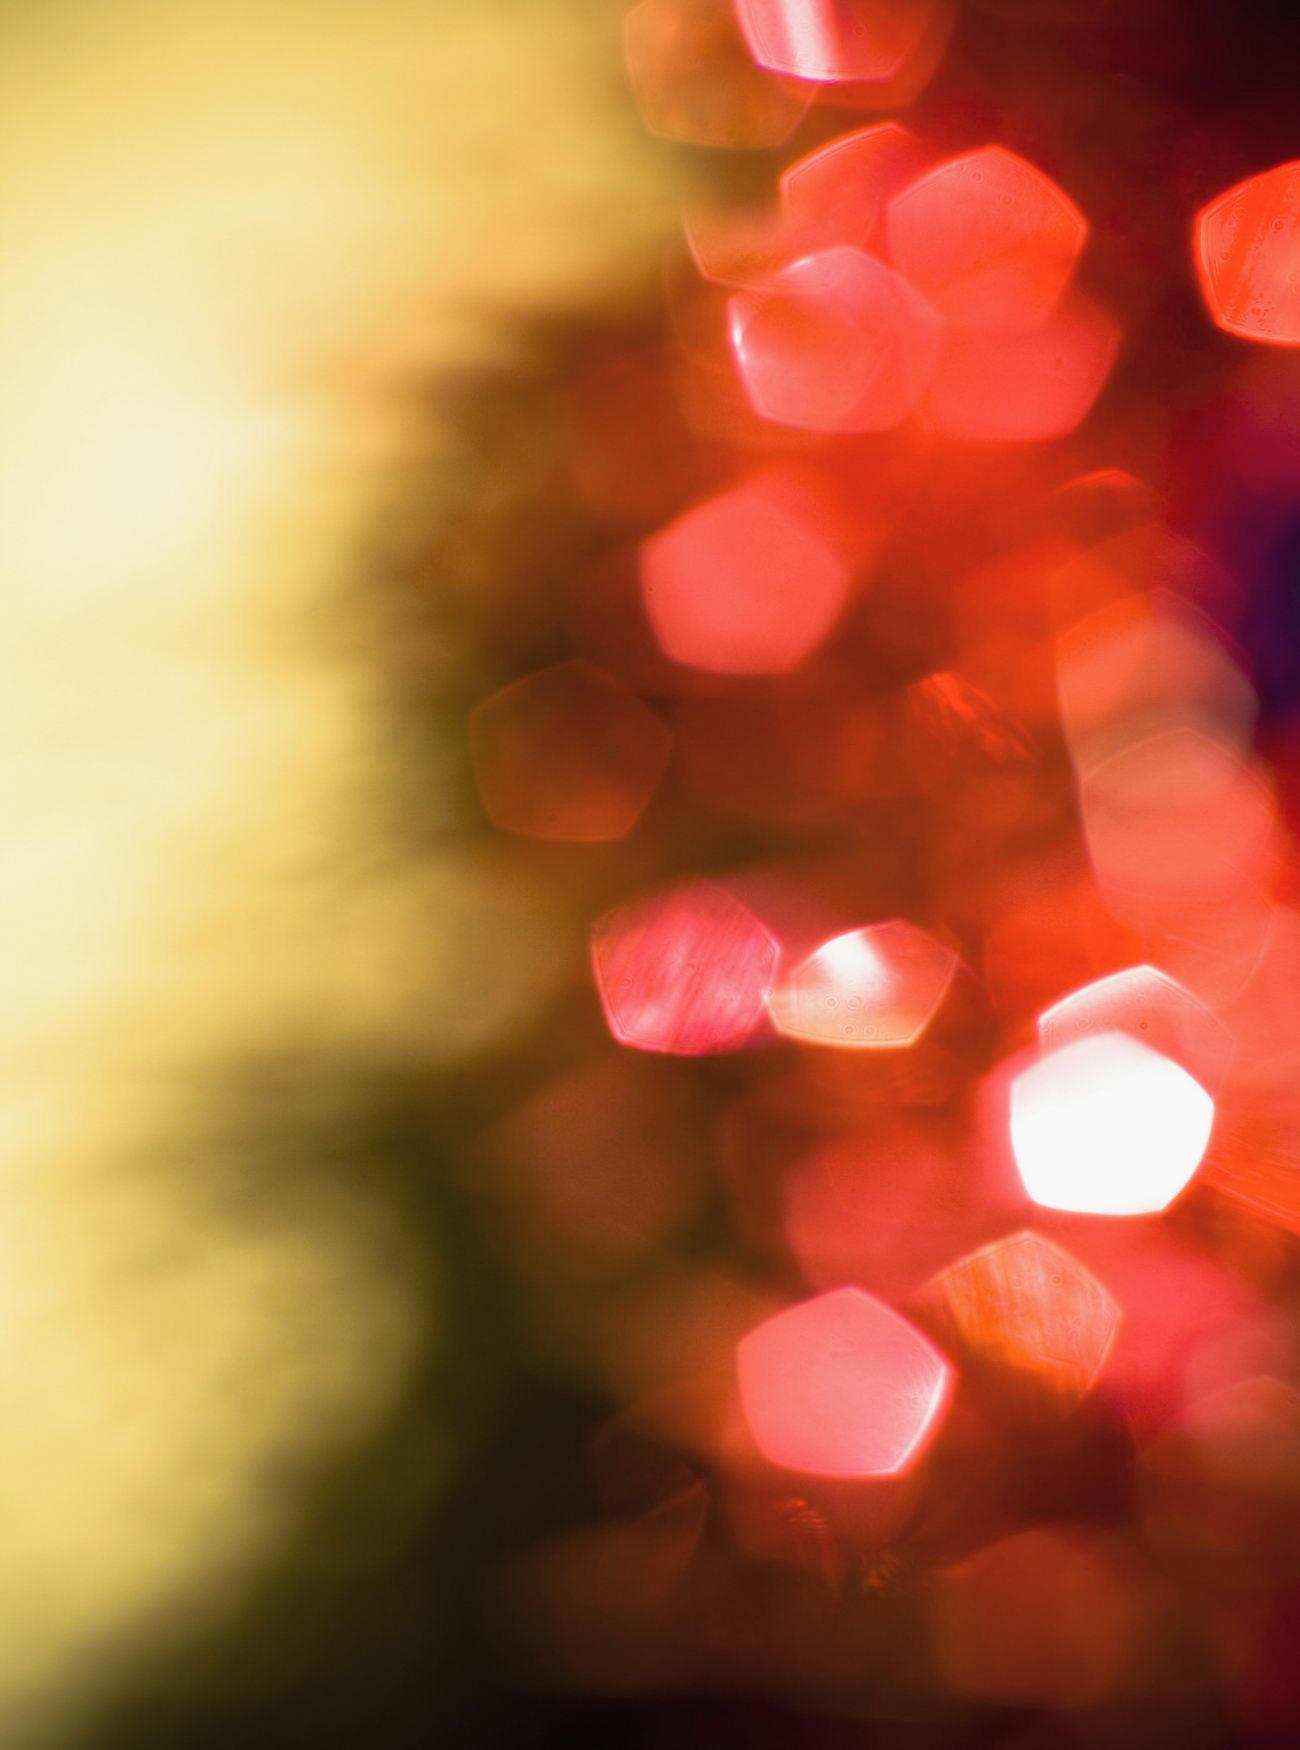 blur background, Abstract, Glow, Xmas, Vivid, HQ Photo